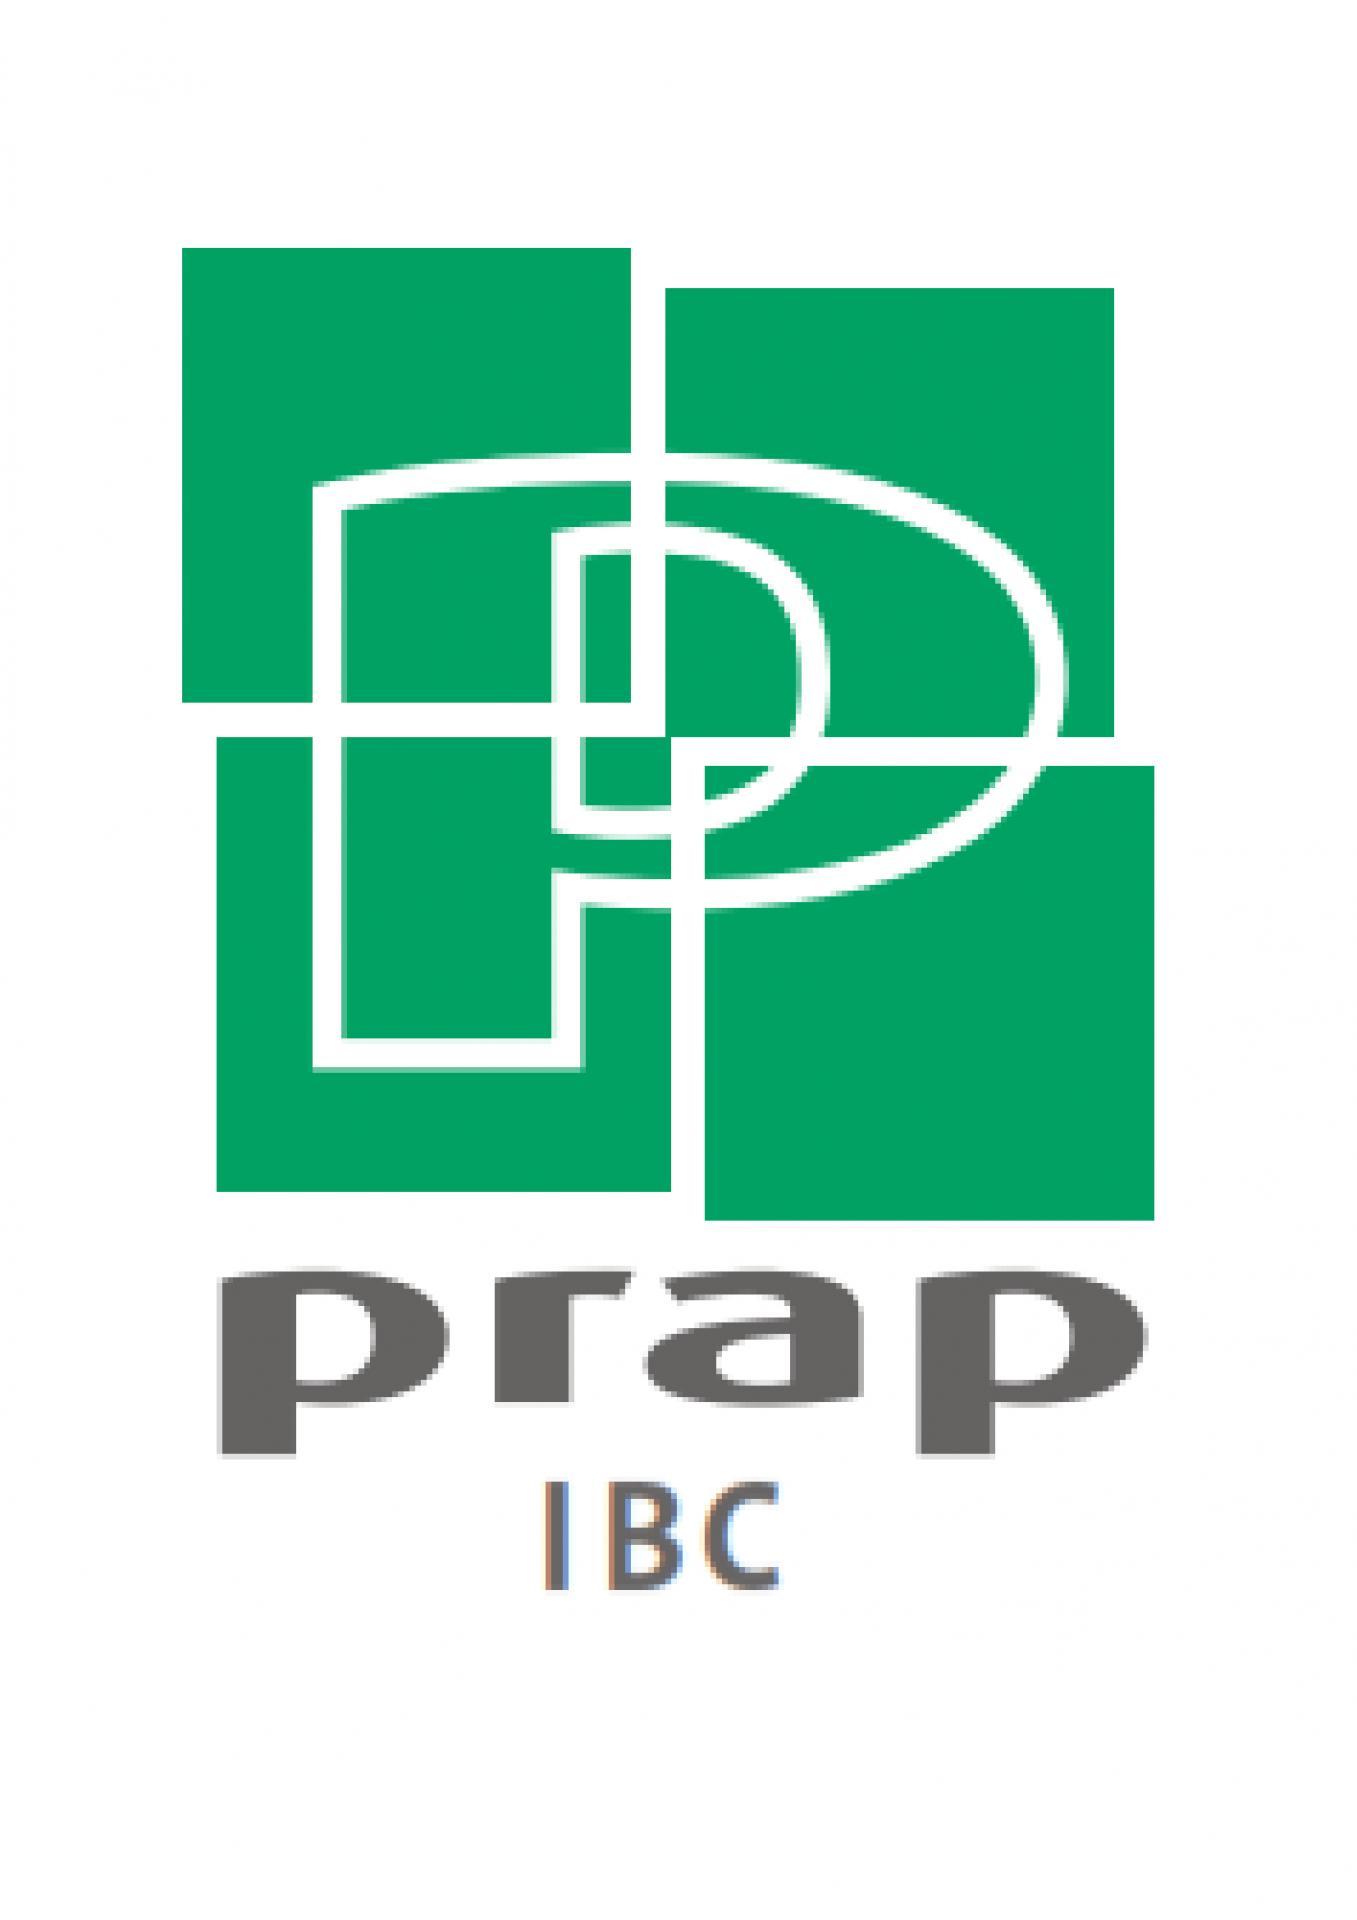 Prap ibc logo